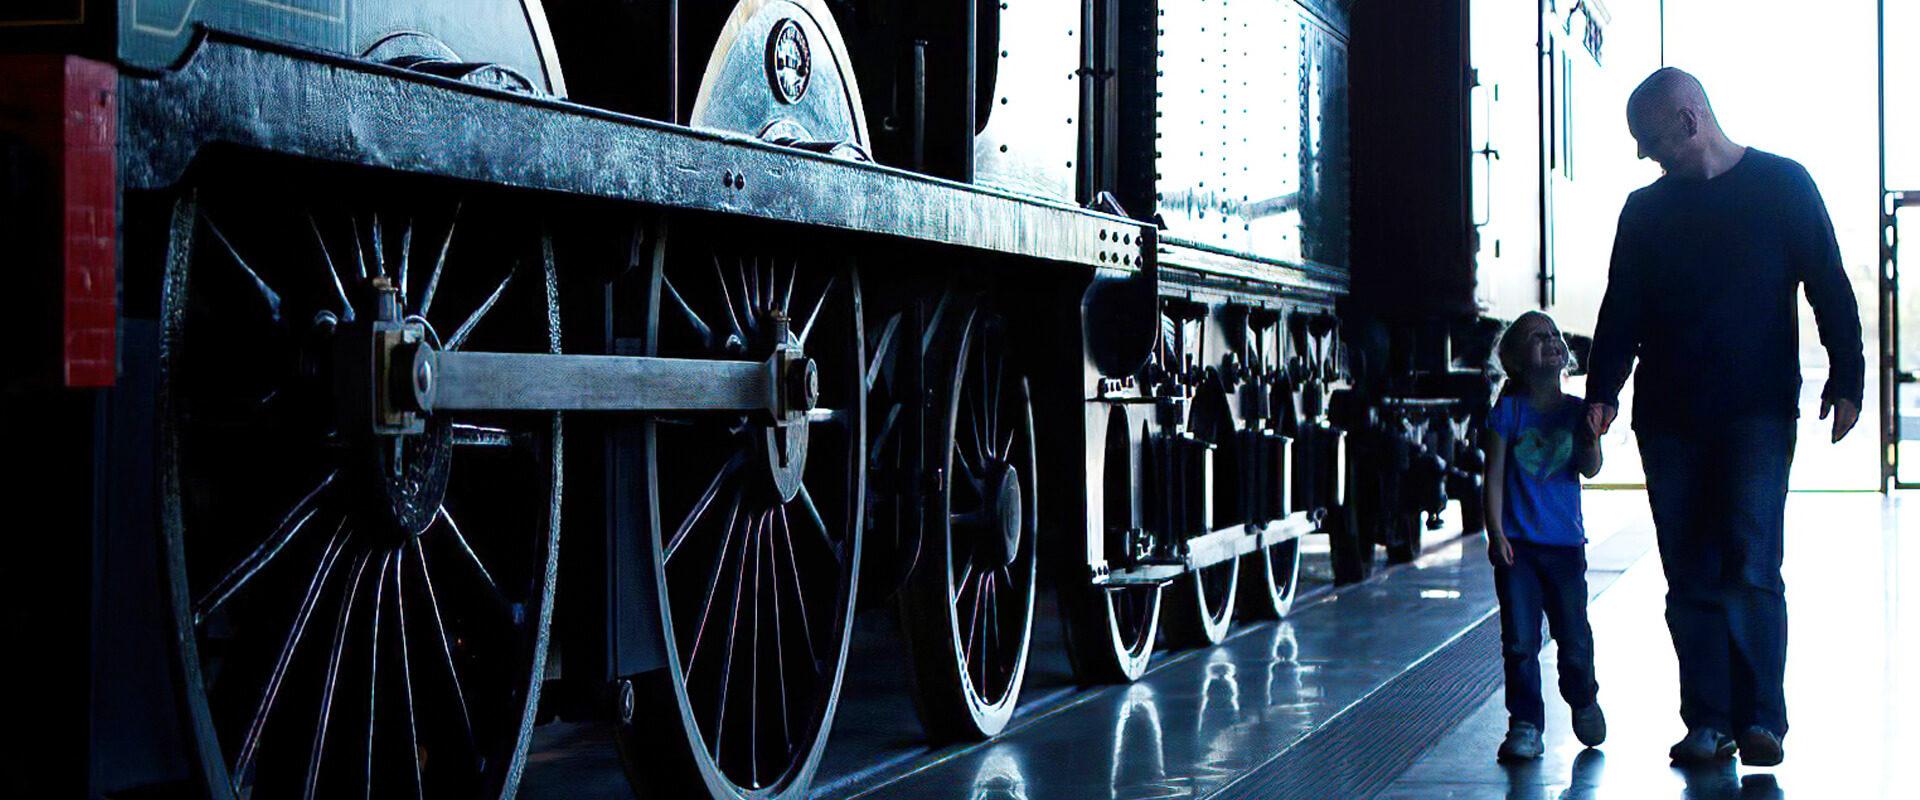 NSW Rail Museum: Wollondilly